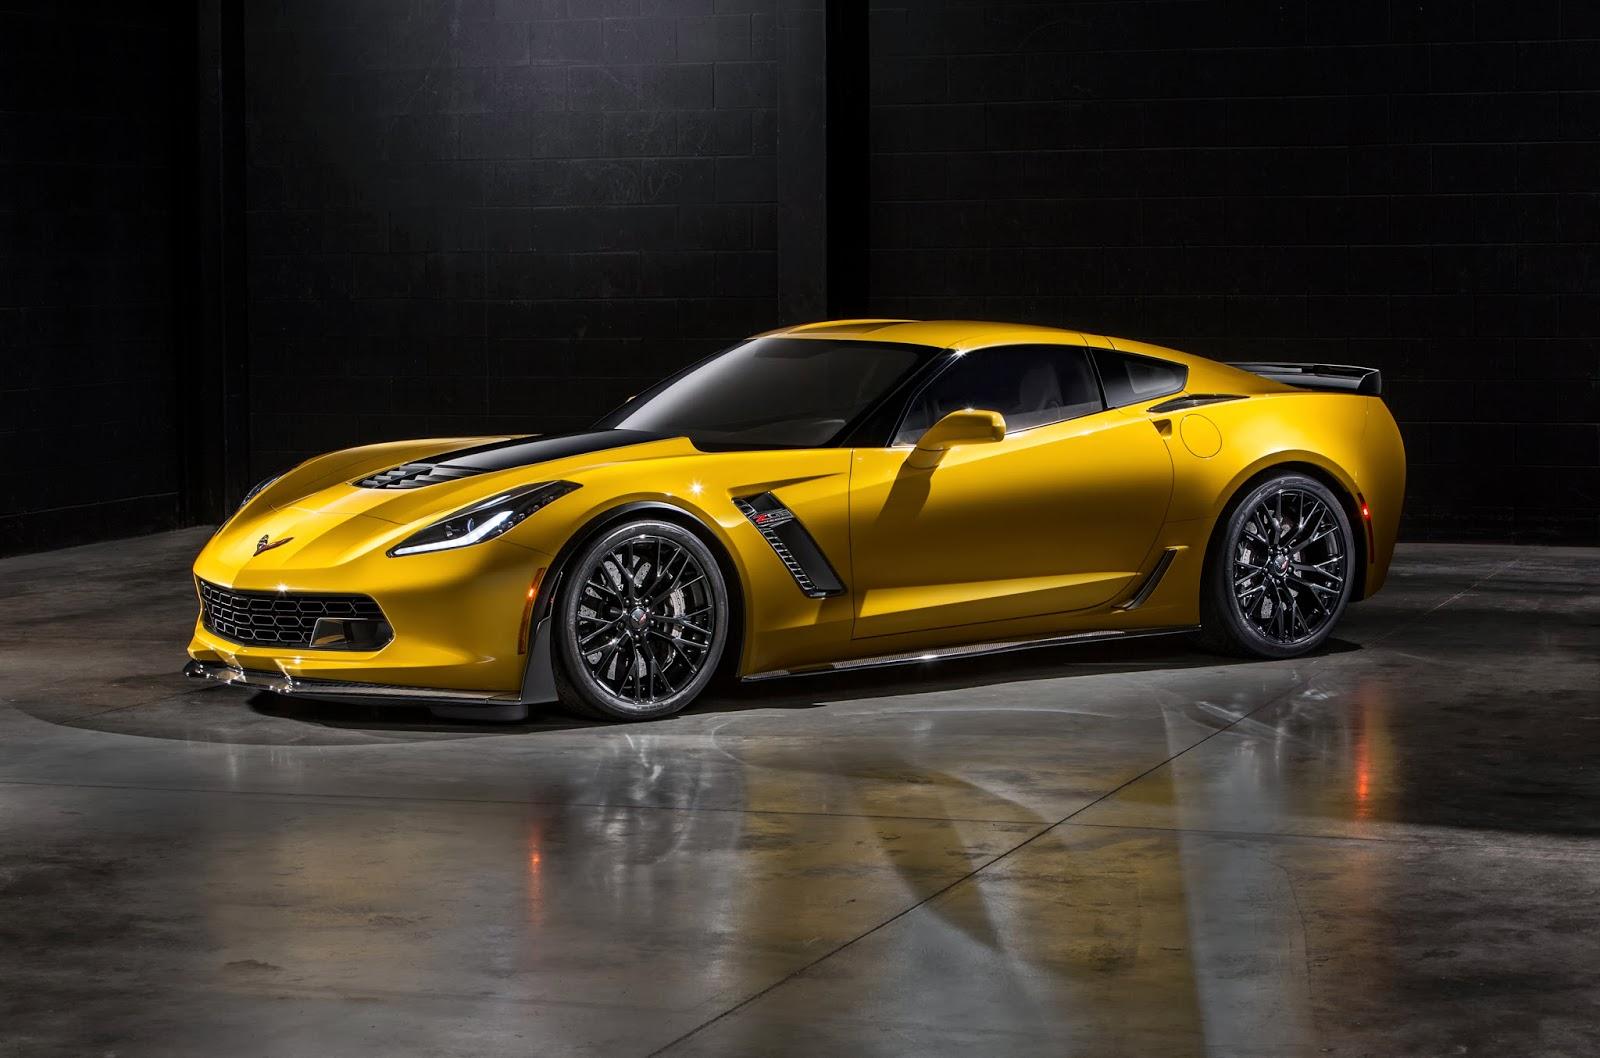 2015 Chevrolet Corvette Z06 Debut